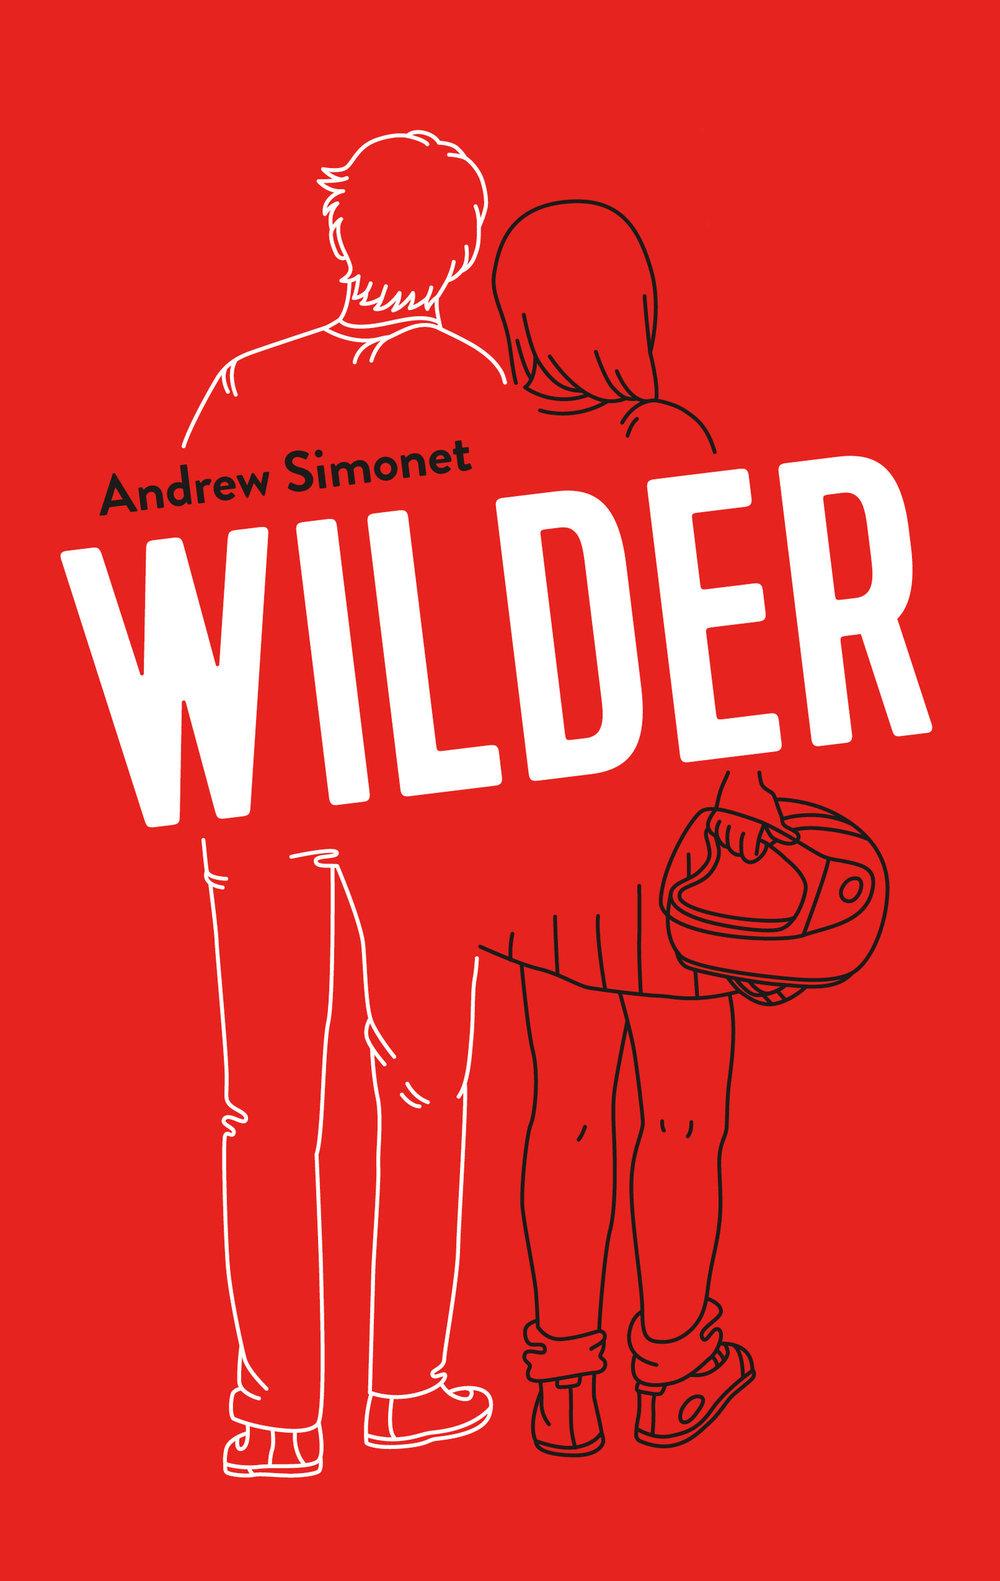 WILDER+FINAL+COVER+12.21.17.jpg